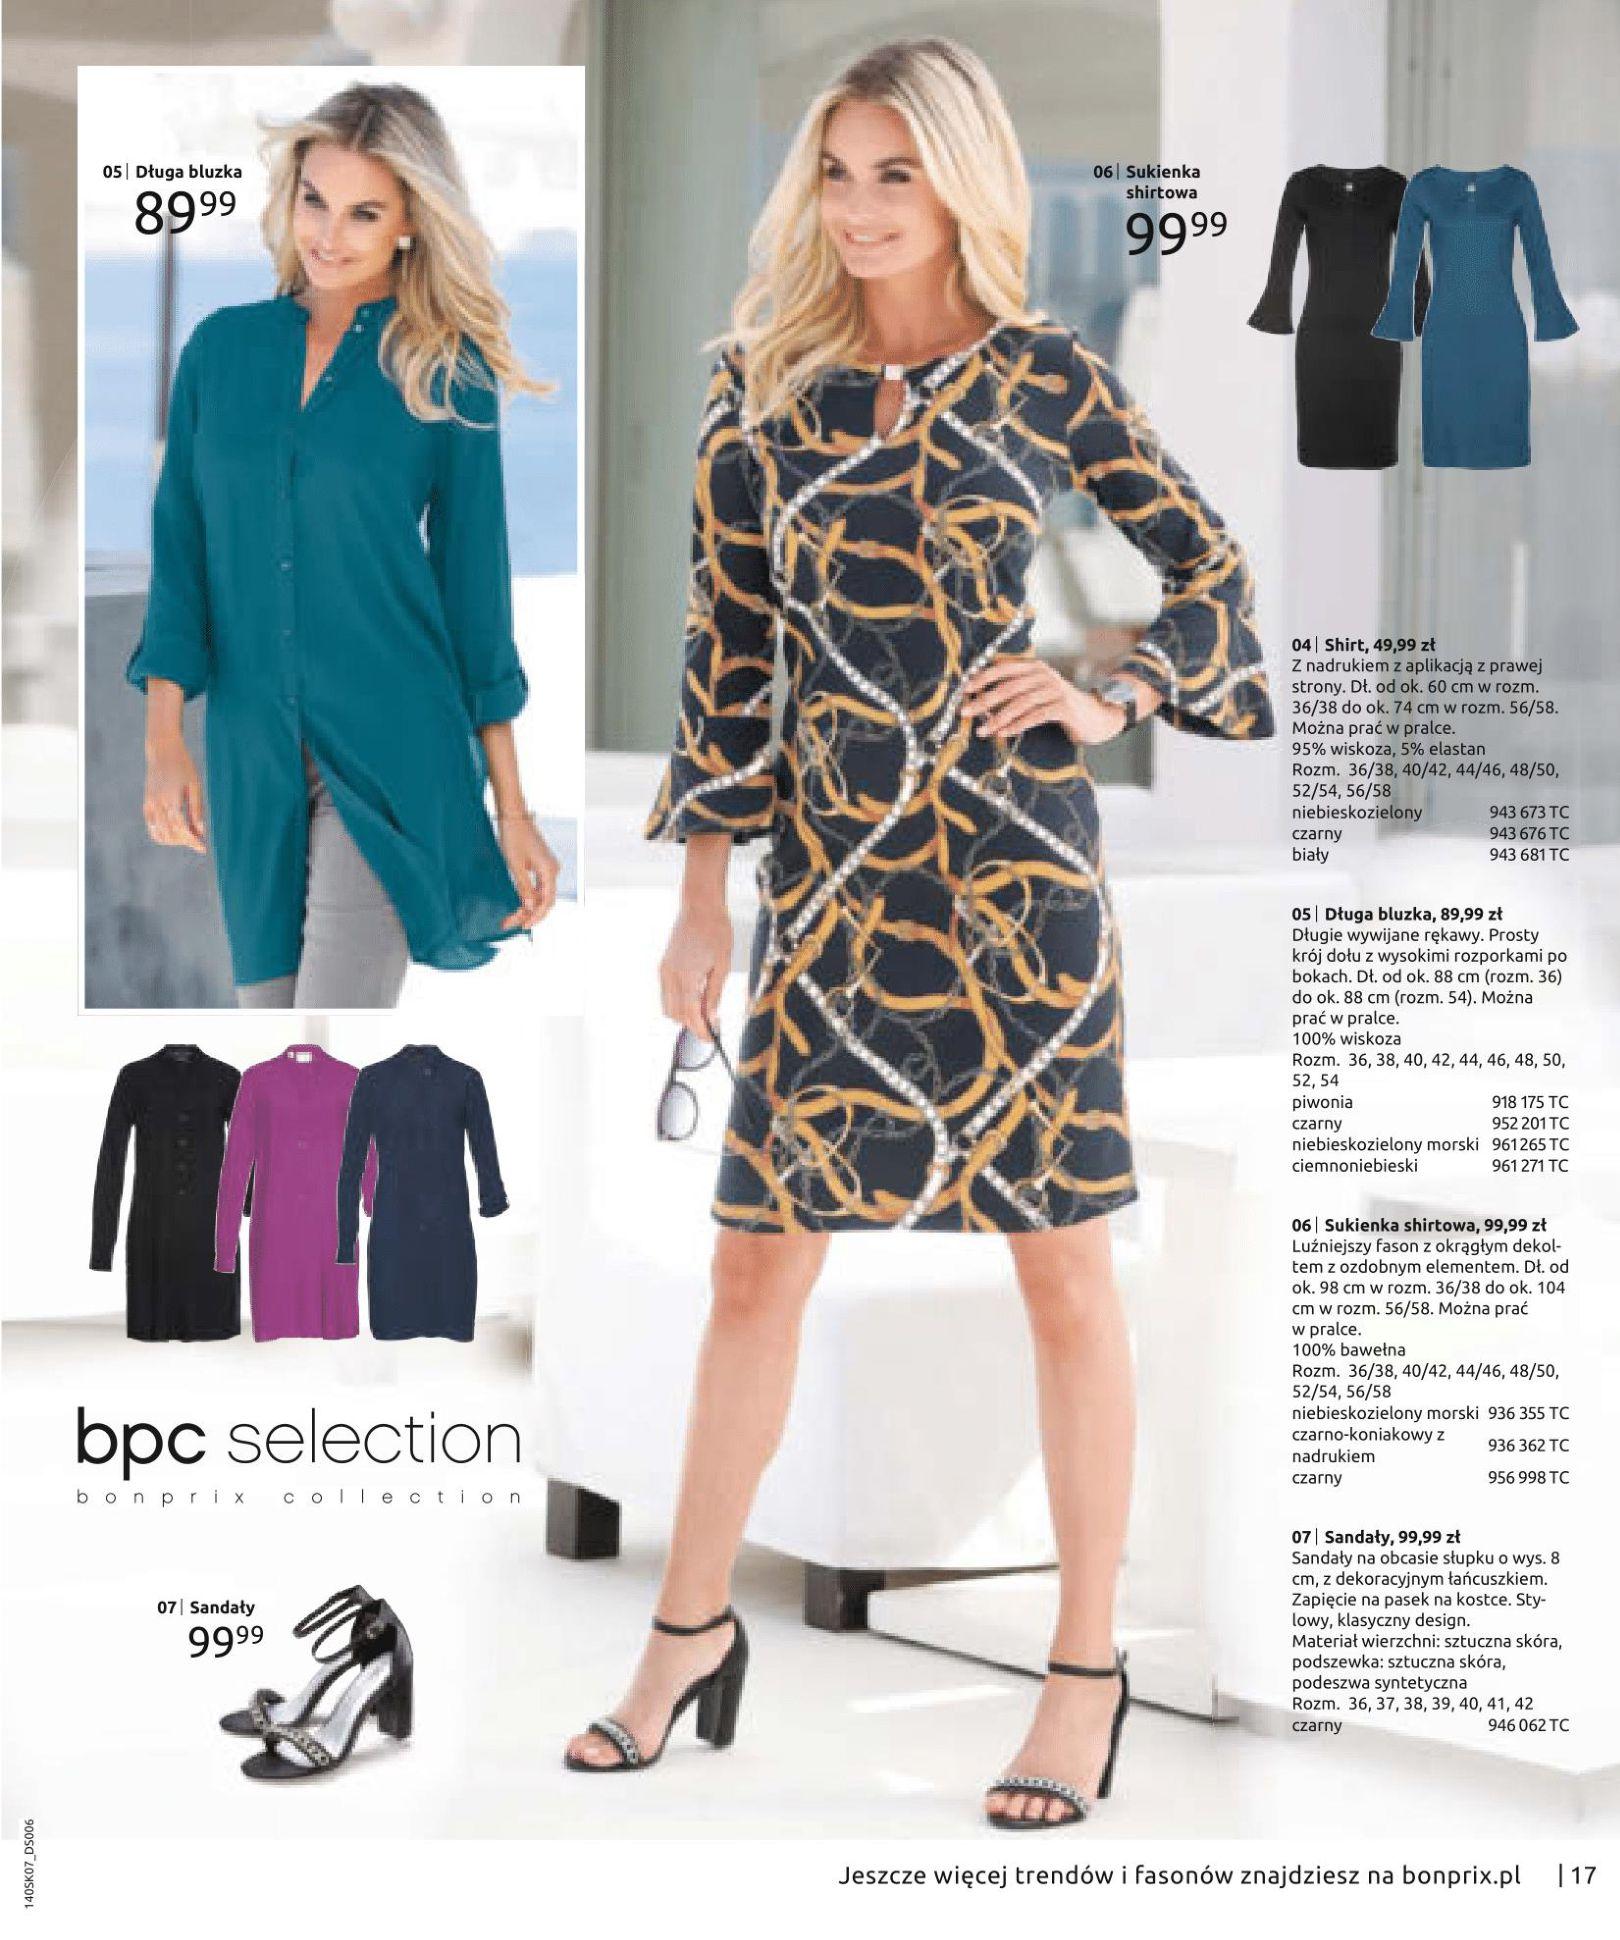 Gazetka Bonprix - Letnie trendy-02.07.2019-15.01.2020-page-19